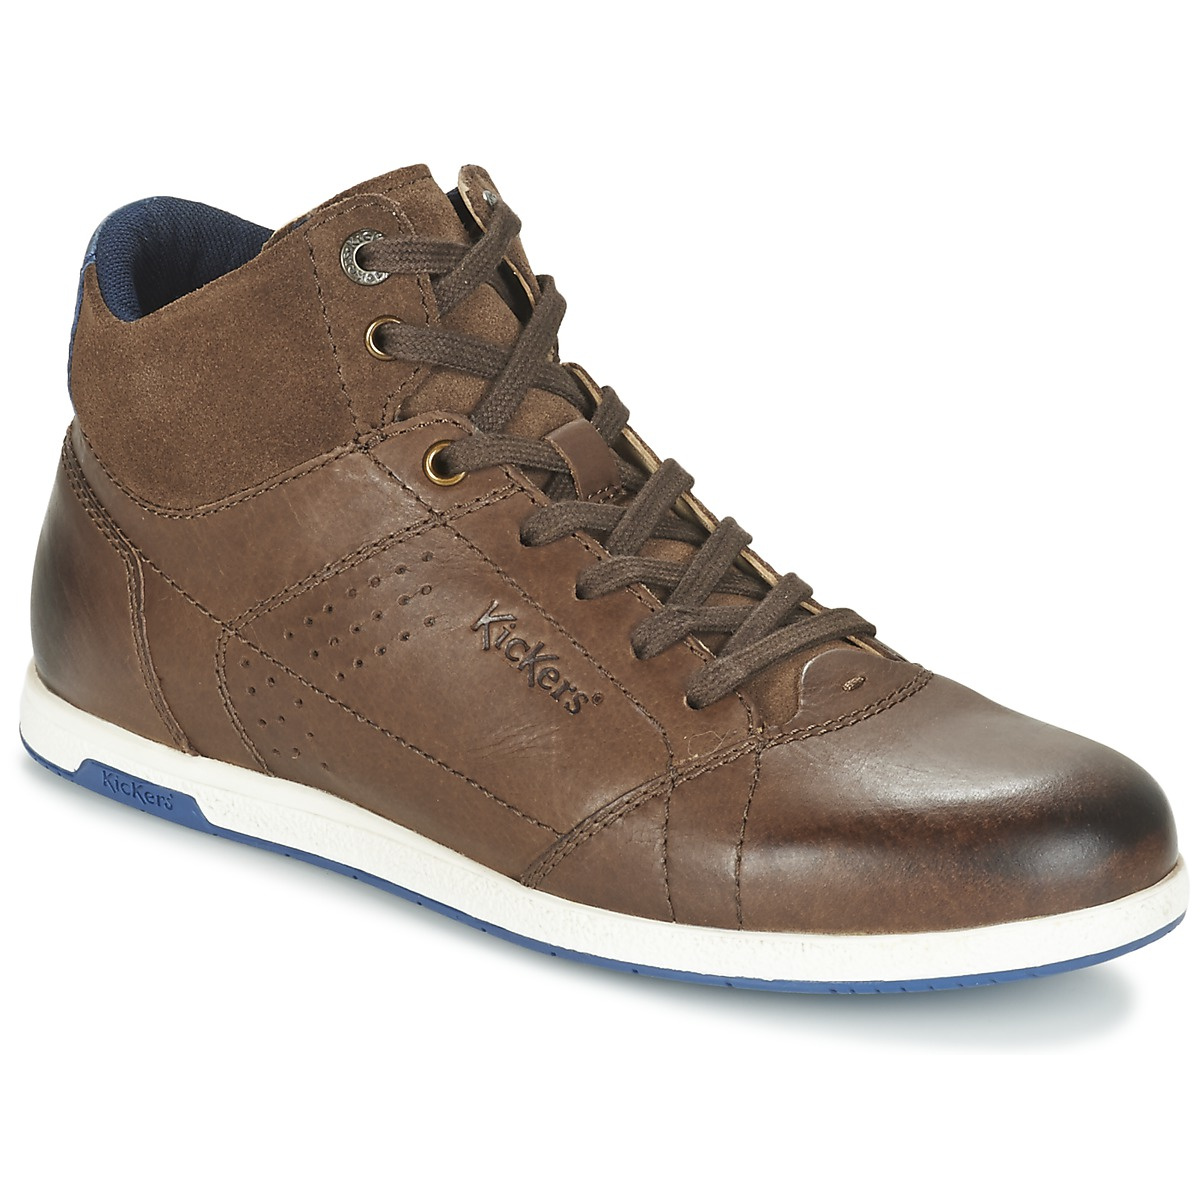 kickers barracuda marron chaussure pas cher avec chaussures basket montante homme. Black Bedroom Furniture Sets. Home Design Ideas